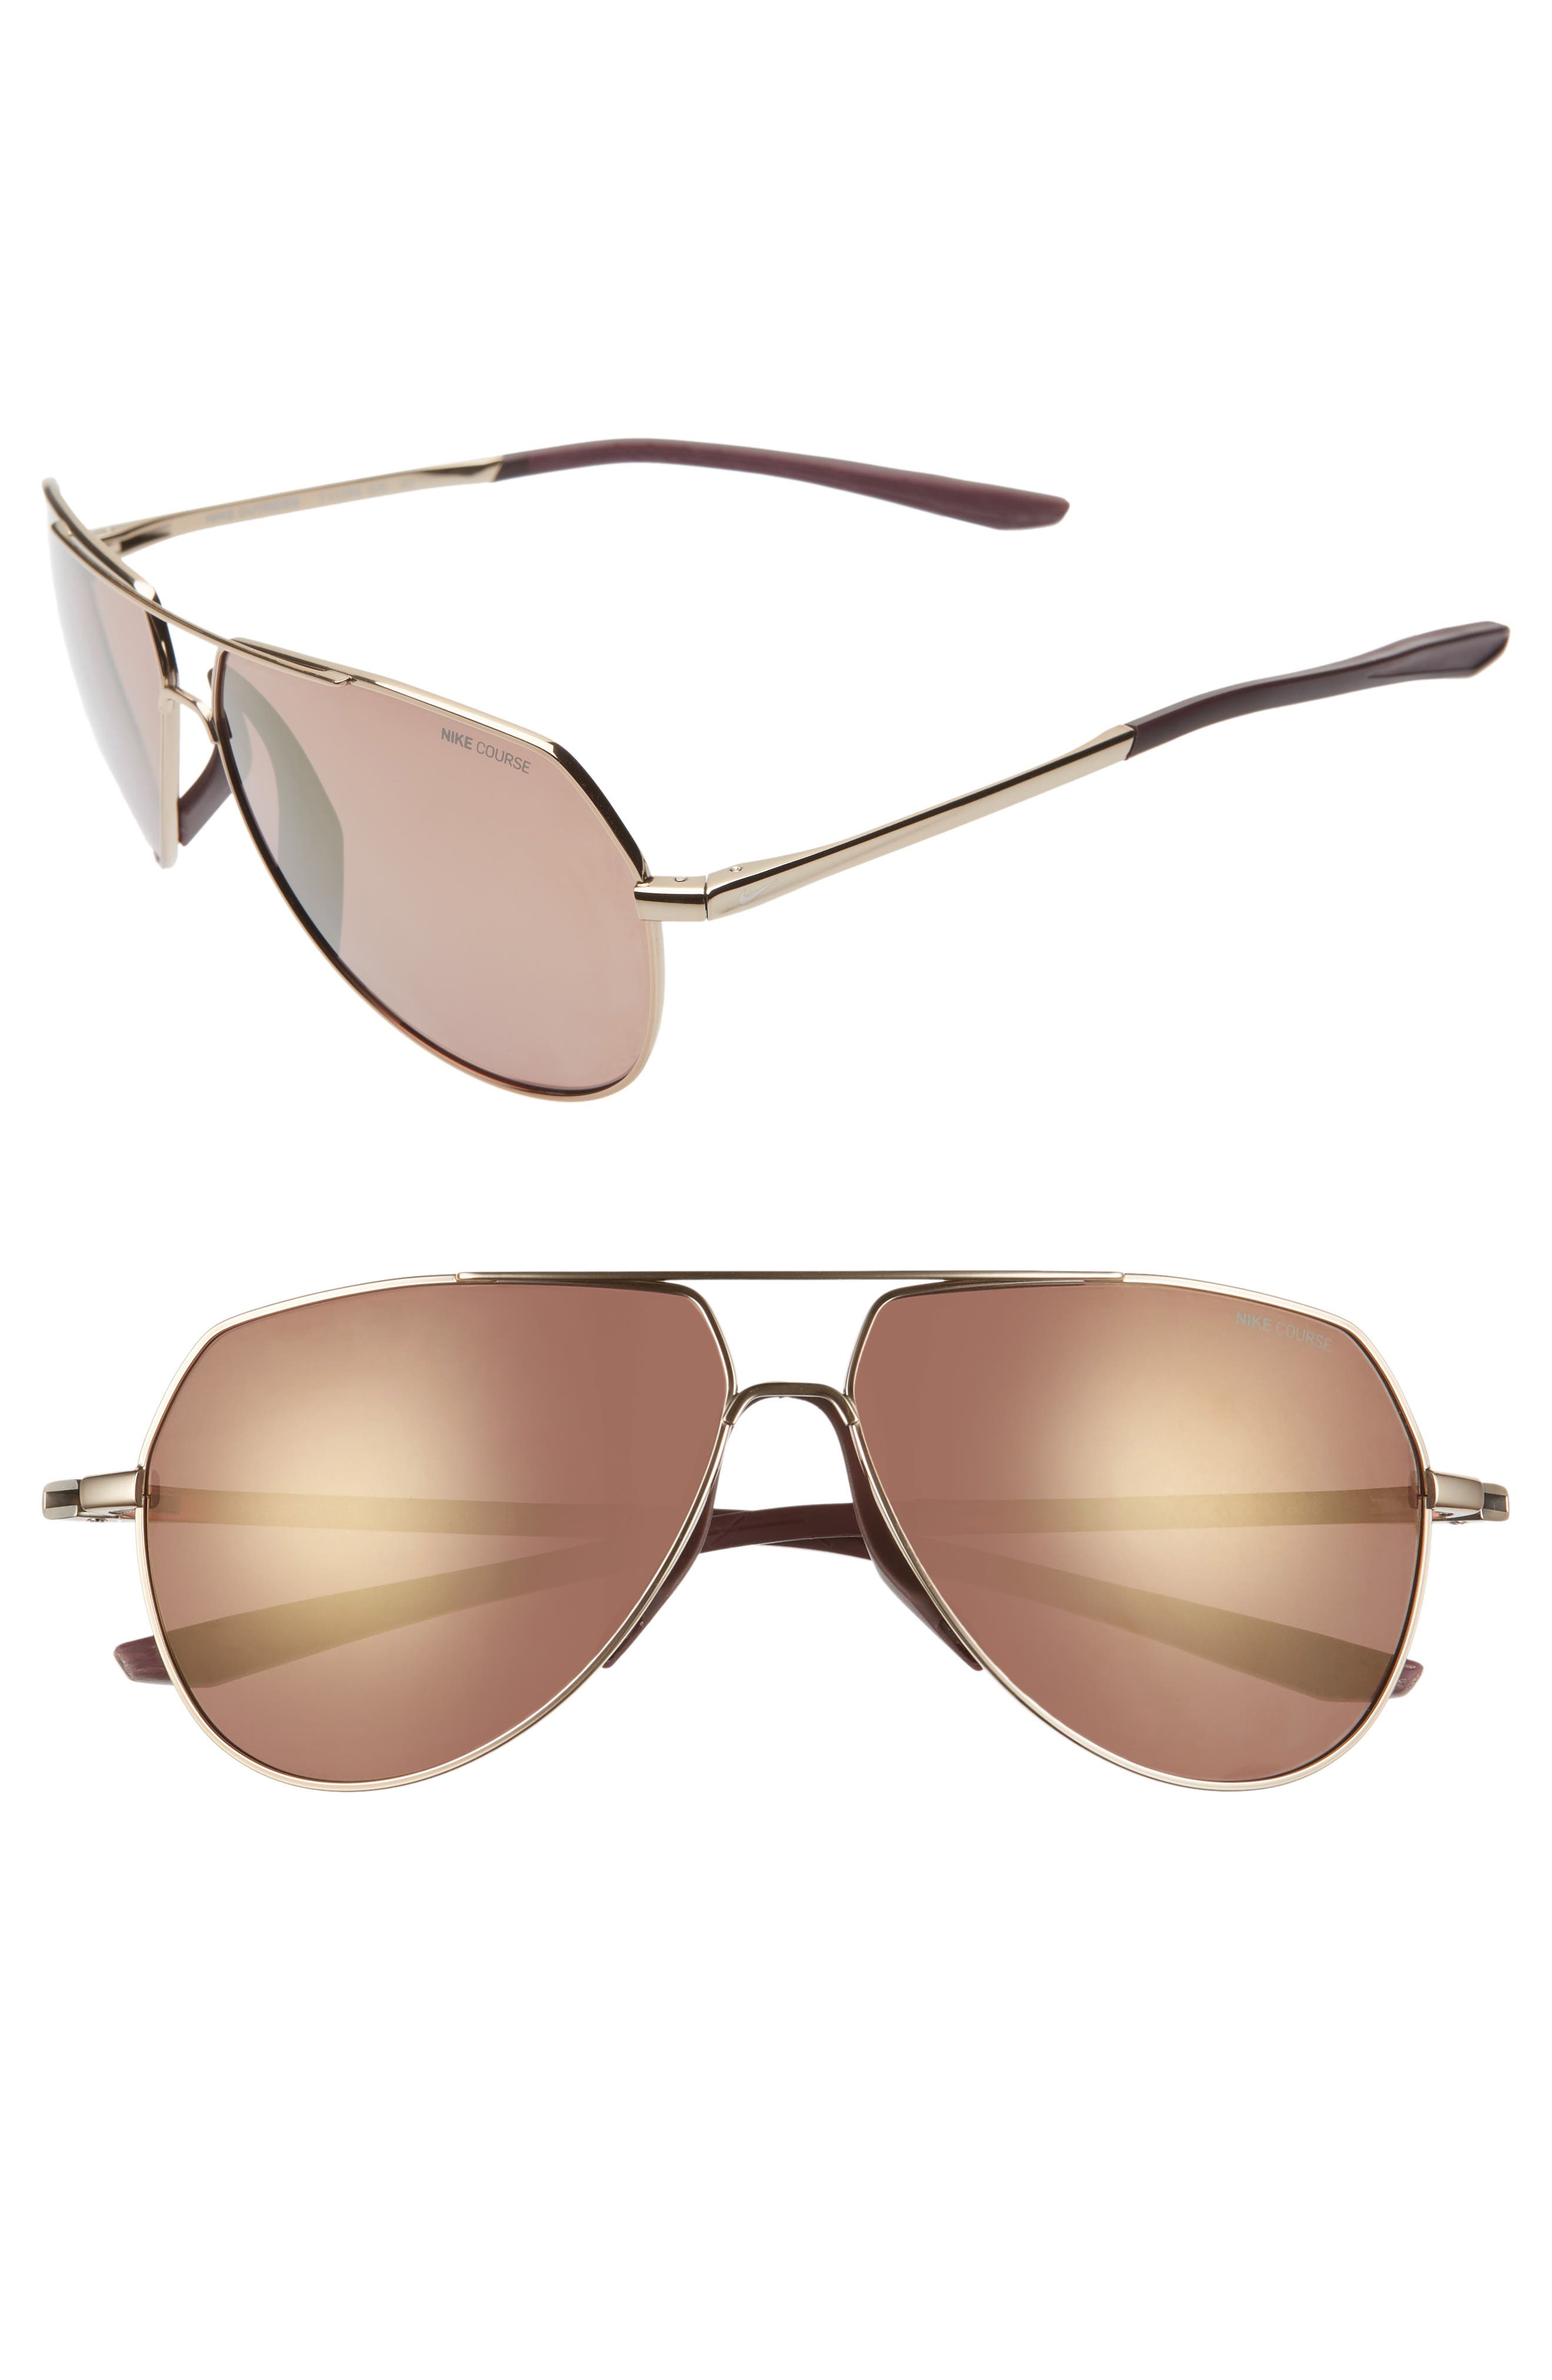 Nike Outrider 62Mm Oversize Mirrored Aviator Sunglasses - Bronze/ Copper